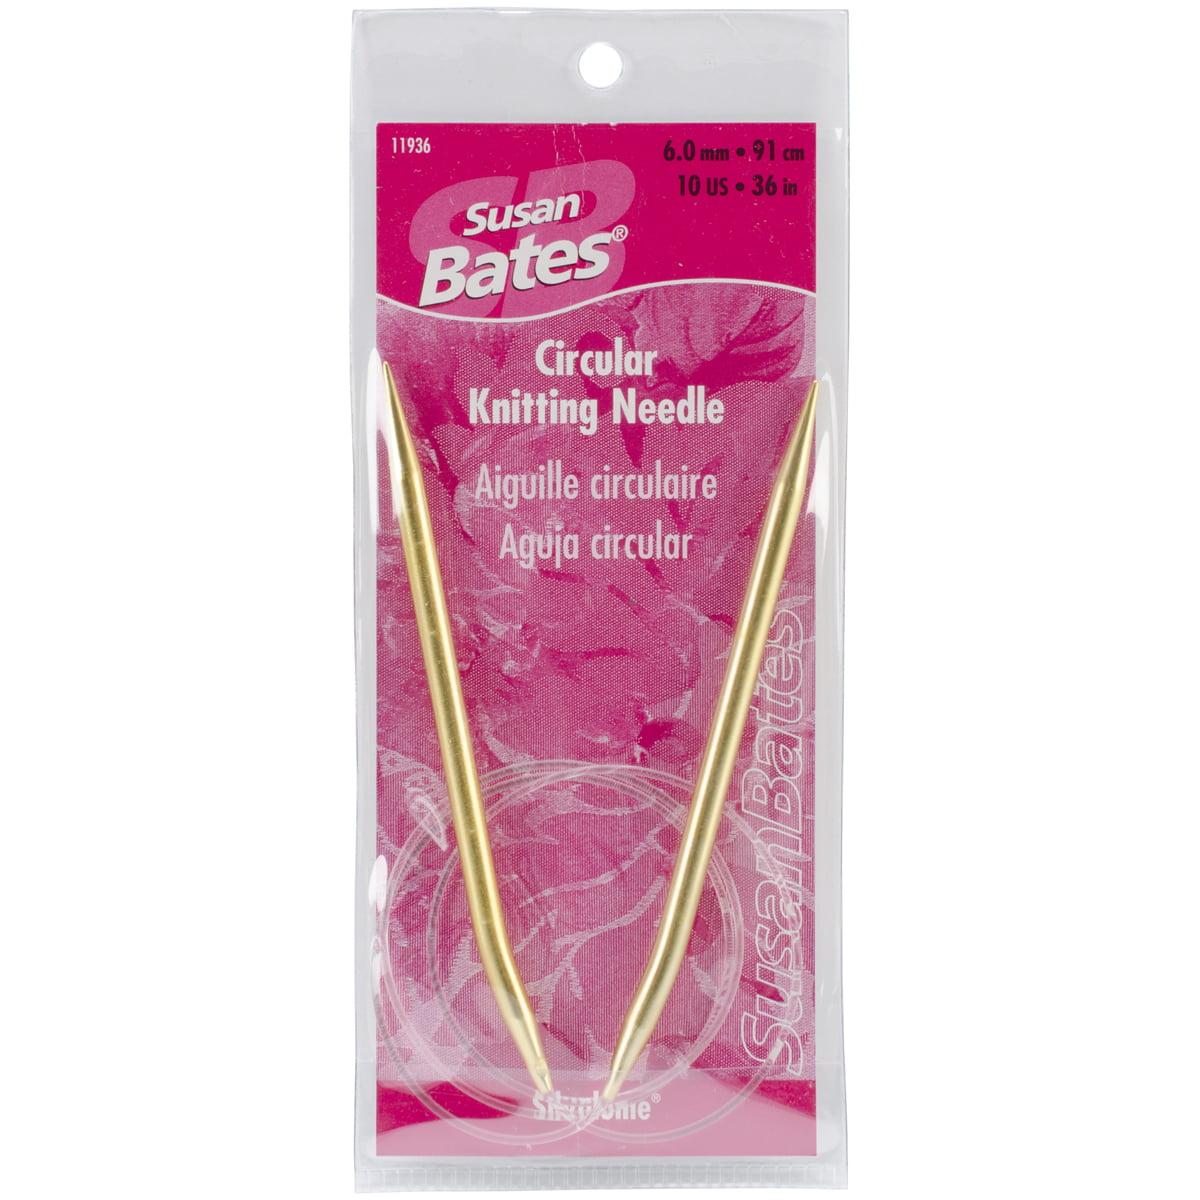 "Susan Bates Silvalume Circular Knitting Needles 36""-Size 10/6mm"